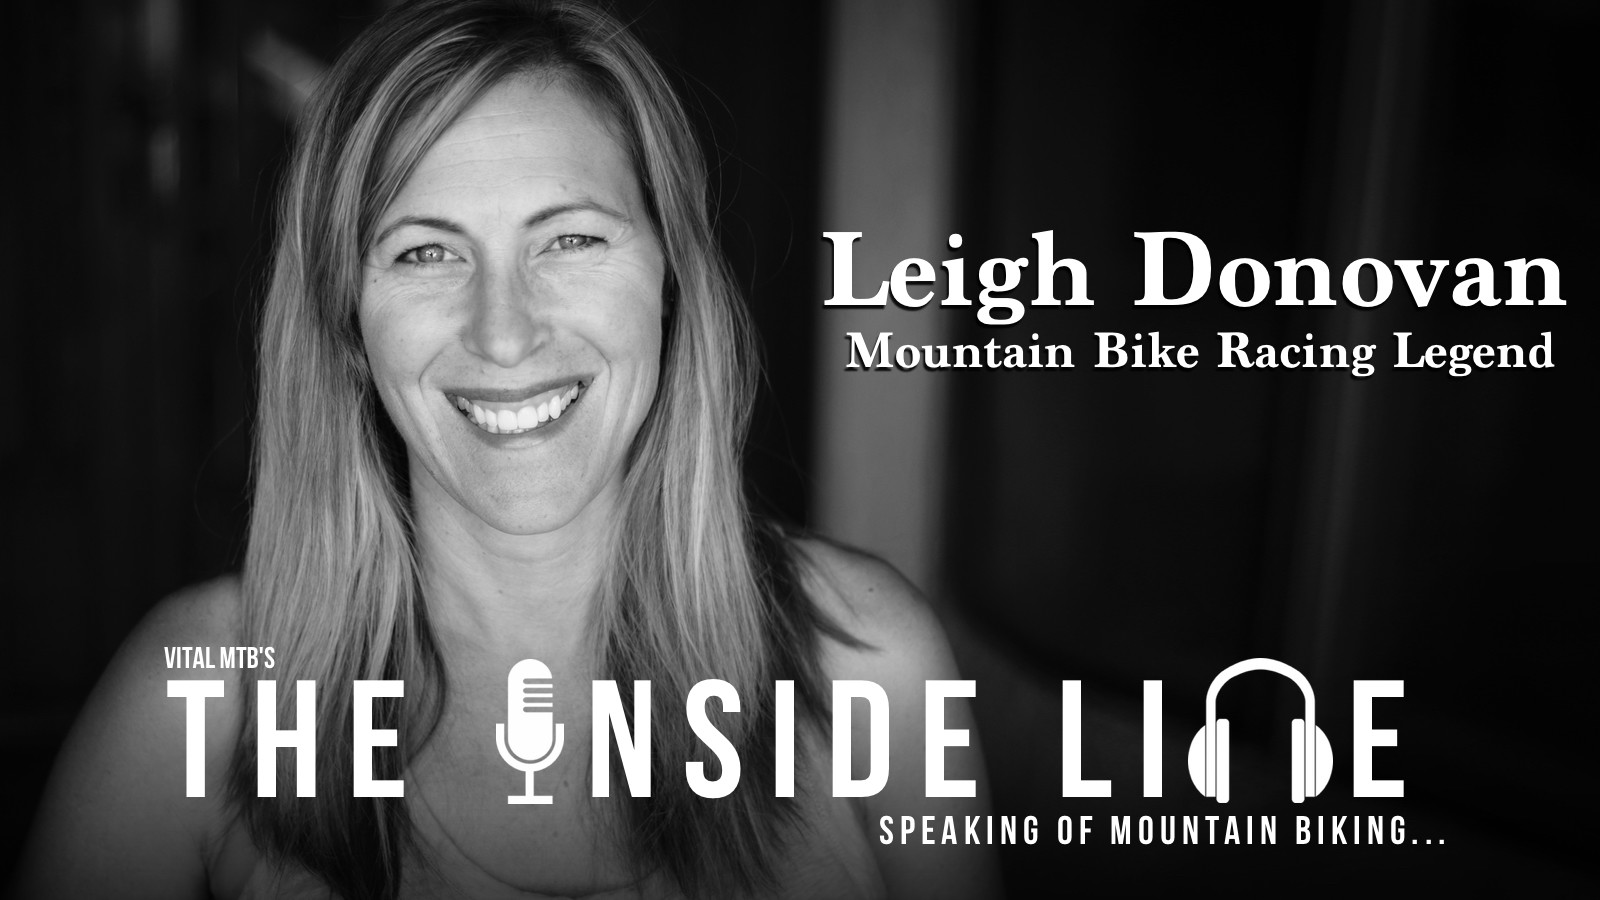 The Inside Line Podcast - Leigh Donovan